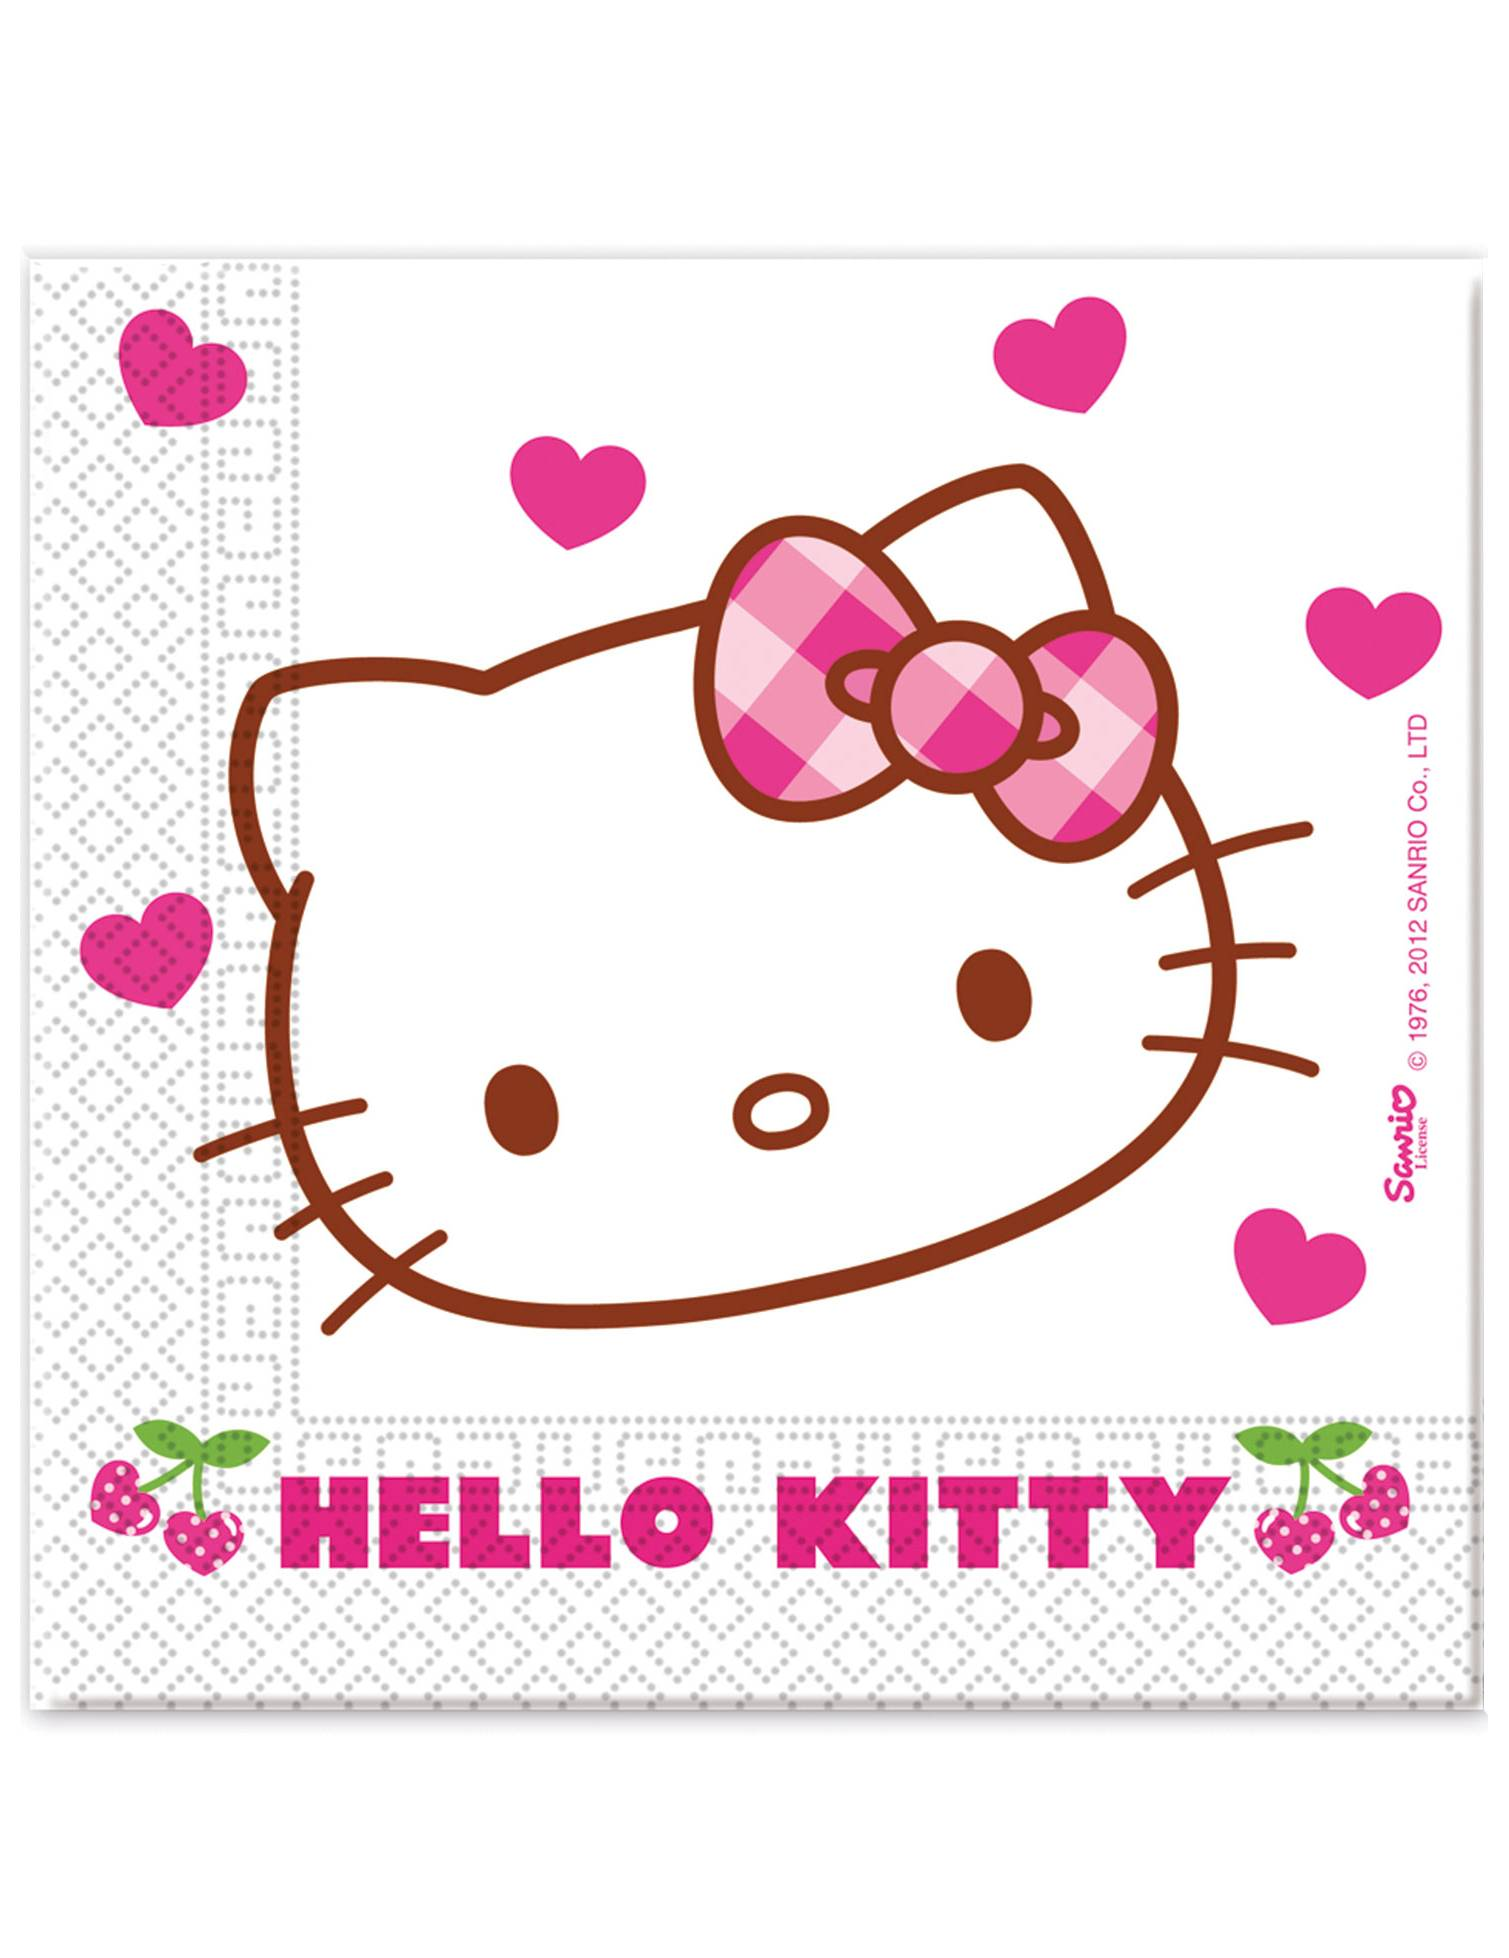 Deguisetoi 20 Serviettes en papier Hello Kitty